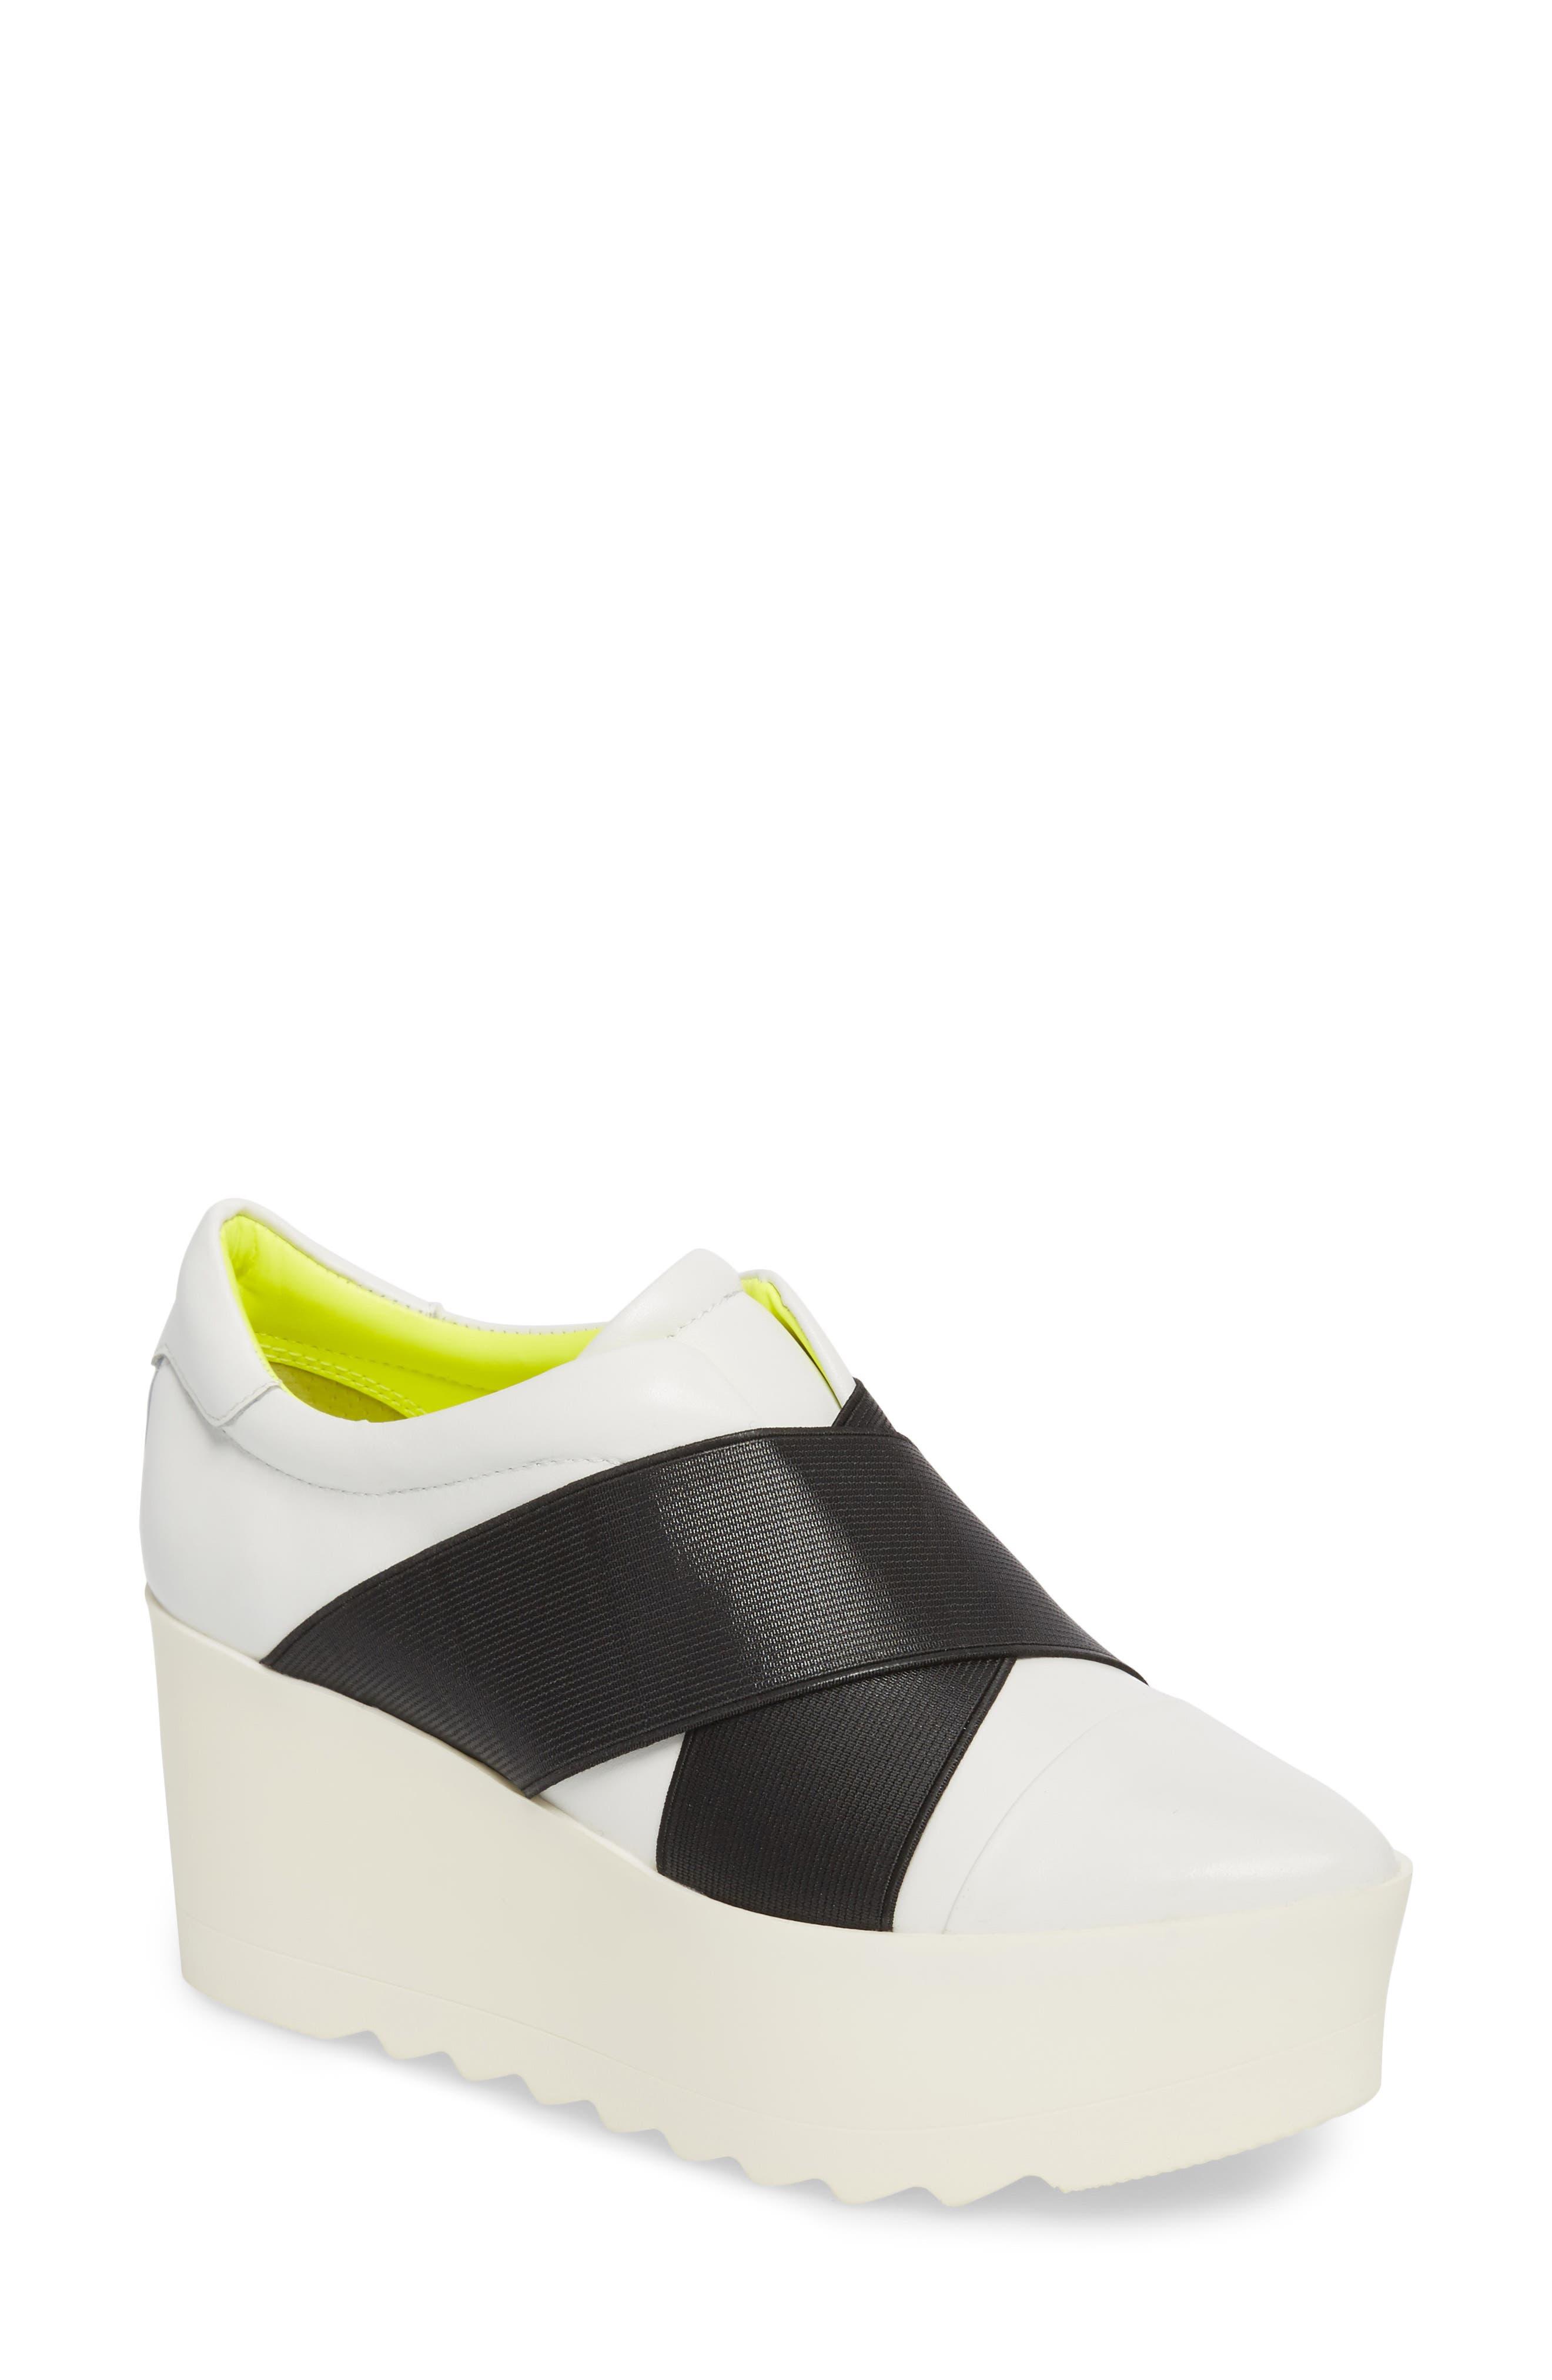 Tasha Platform Slip-On Sneaker,                             Main thumbnail 1, color,                             White Leather